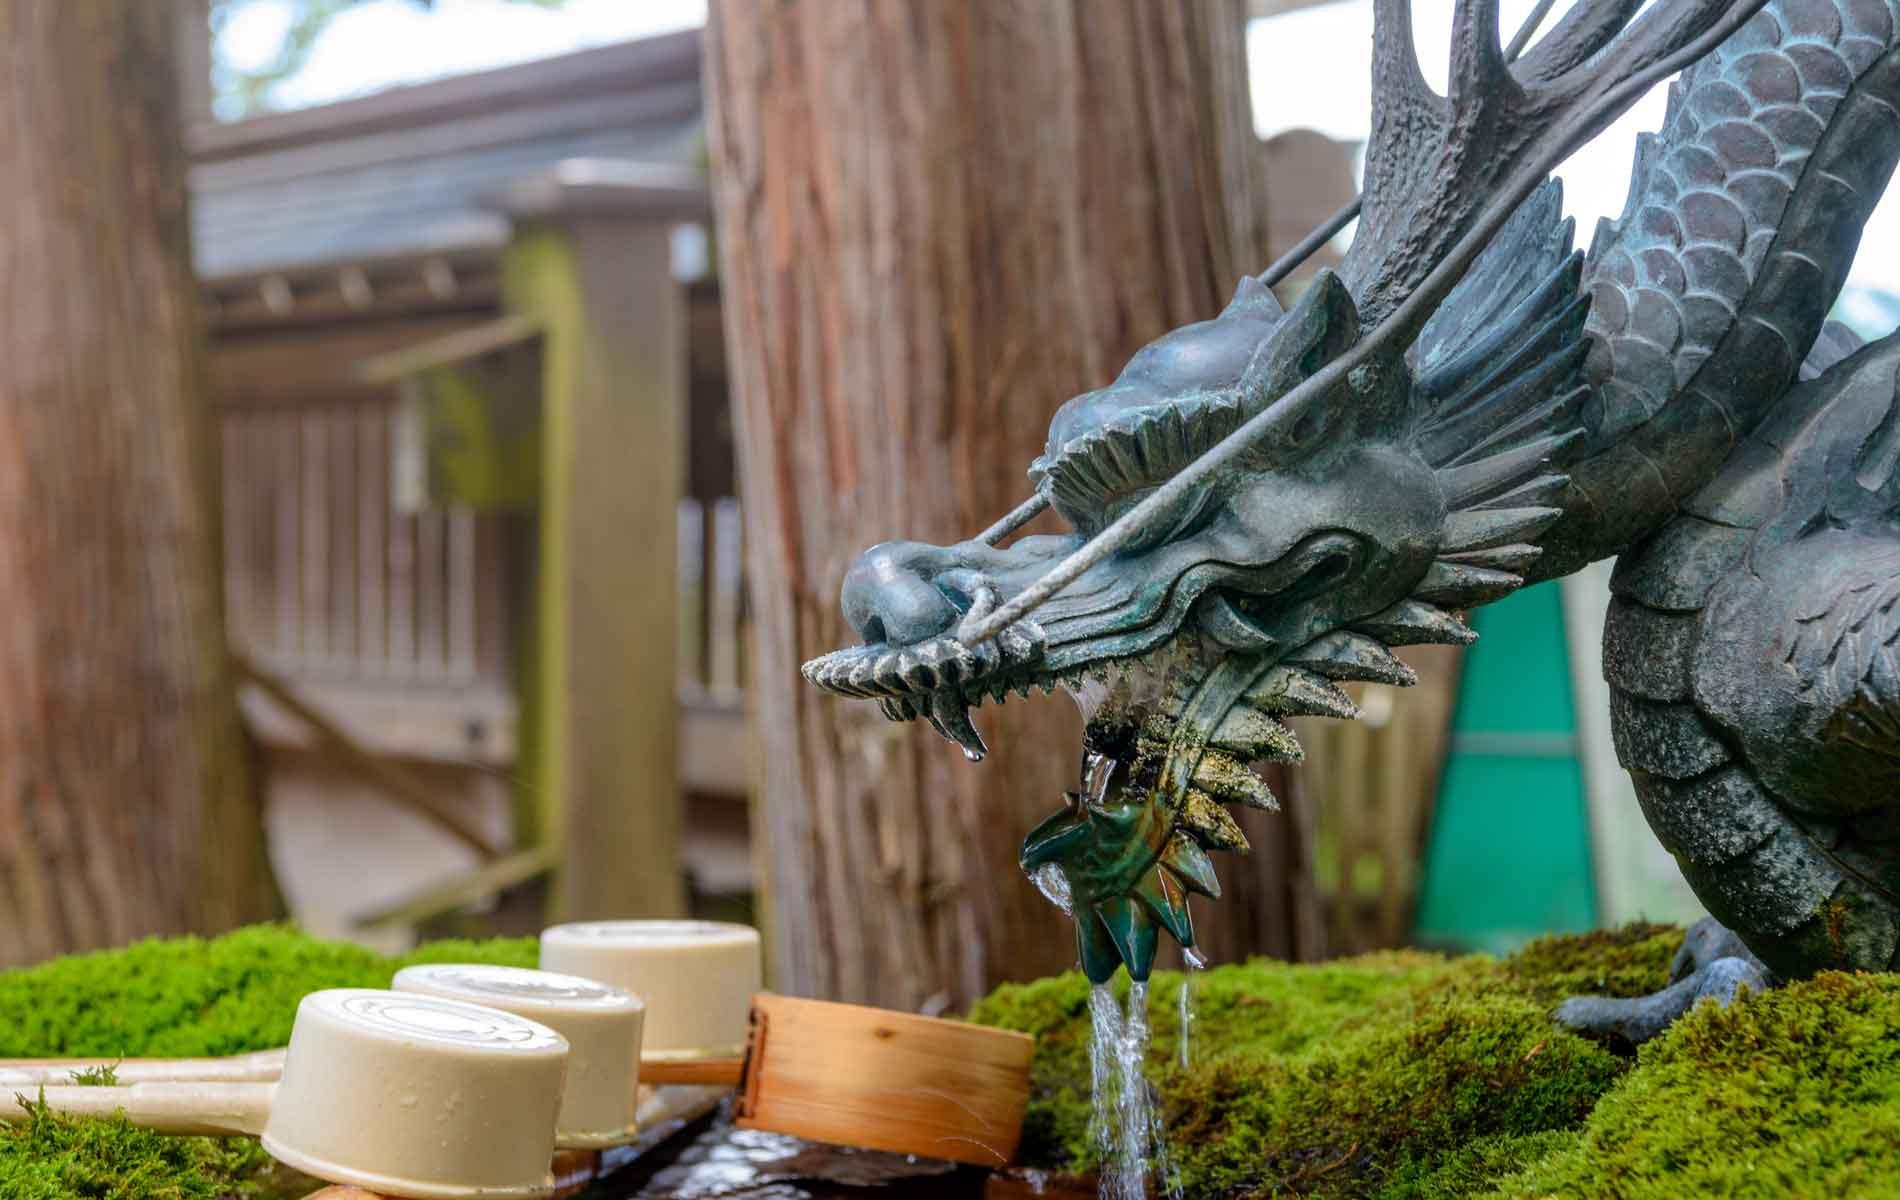 Scenery of the Suwa taisha shrine in Nagano, Japan